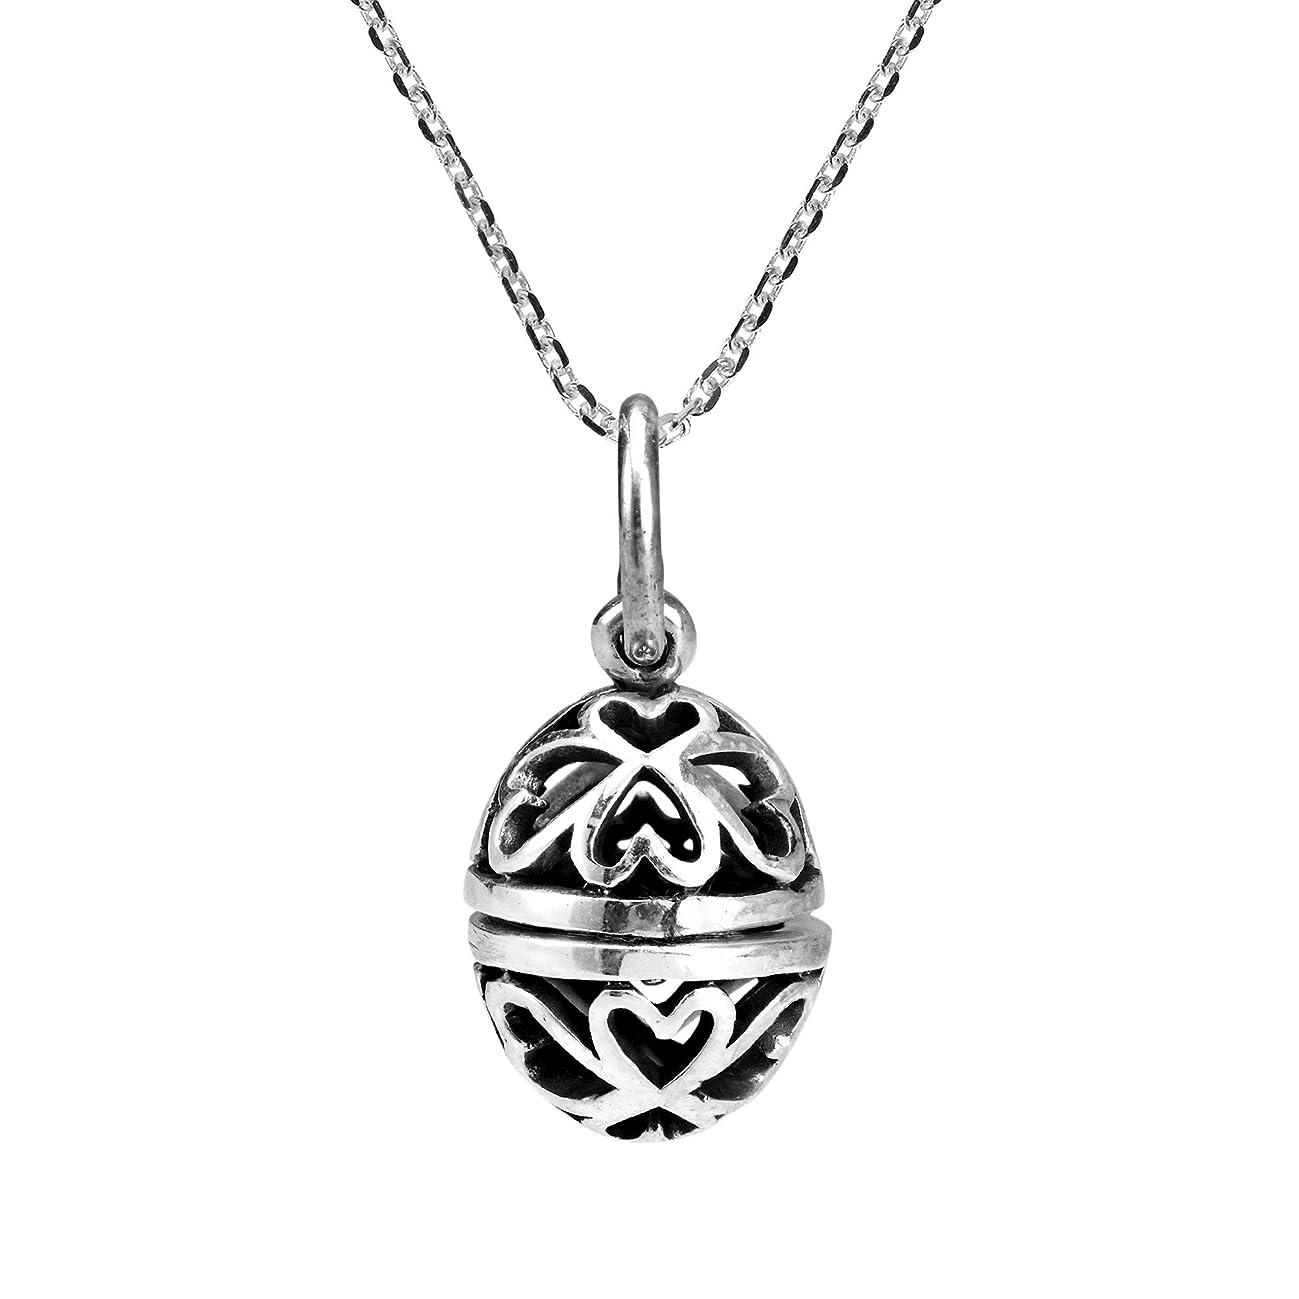 AeraVida Open Heart Oval Egg Locket .925 Sterling Silver Pendant Necklace